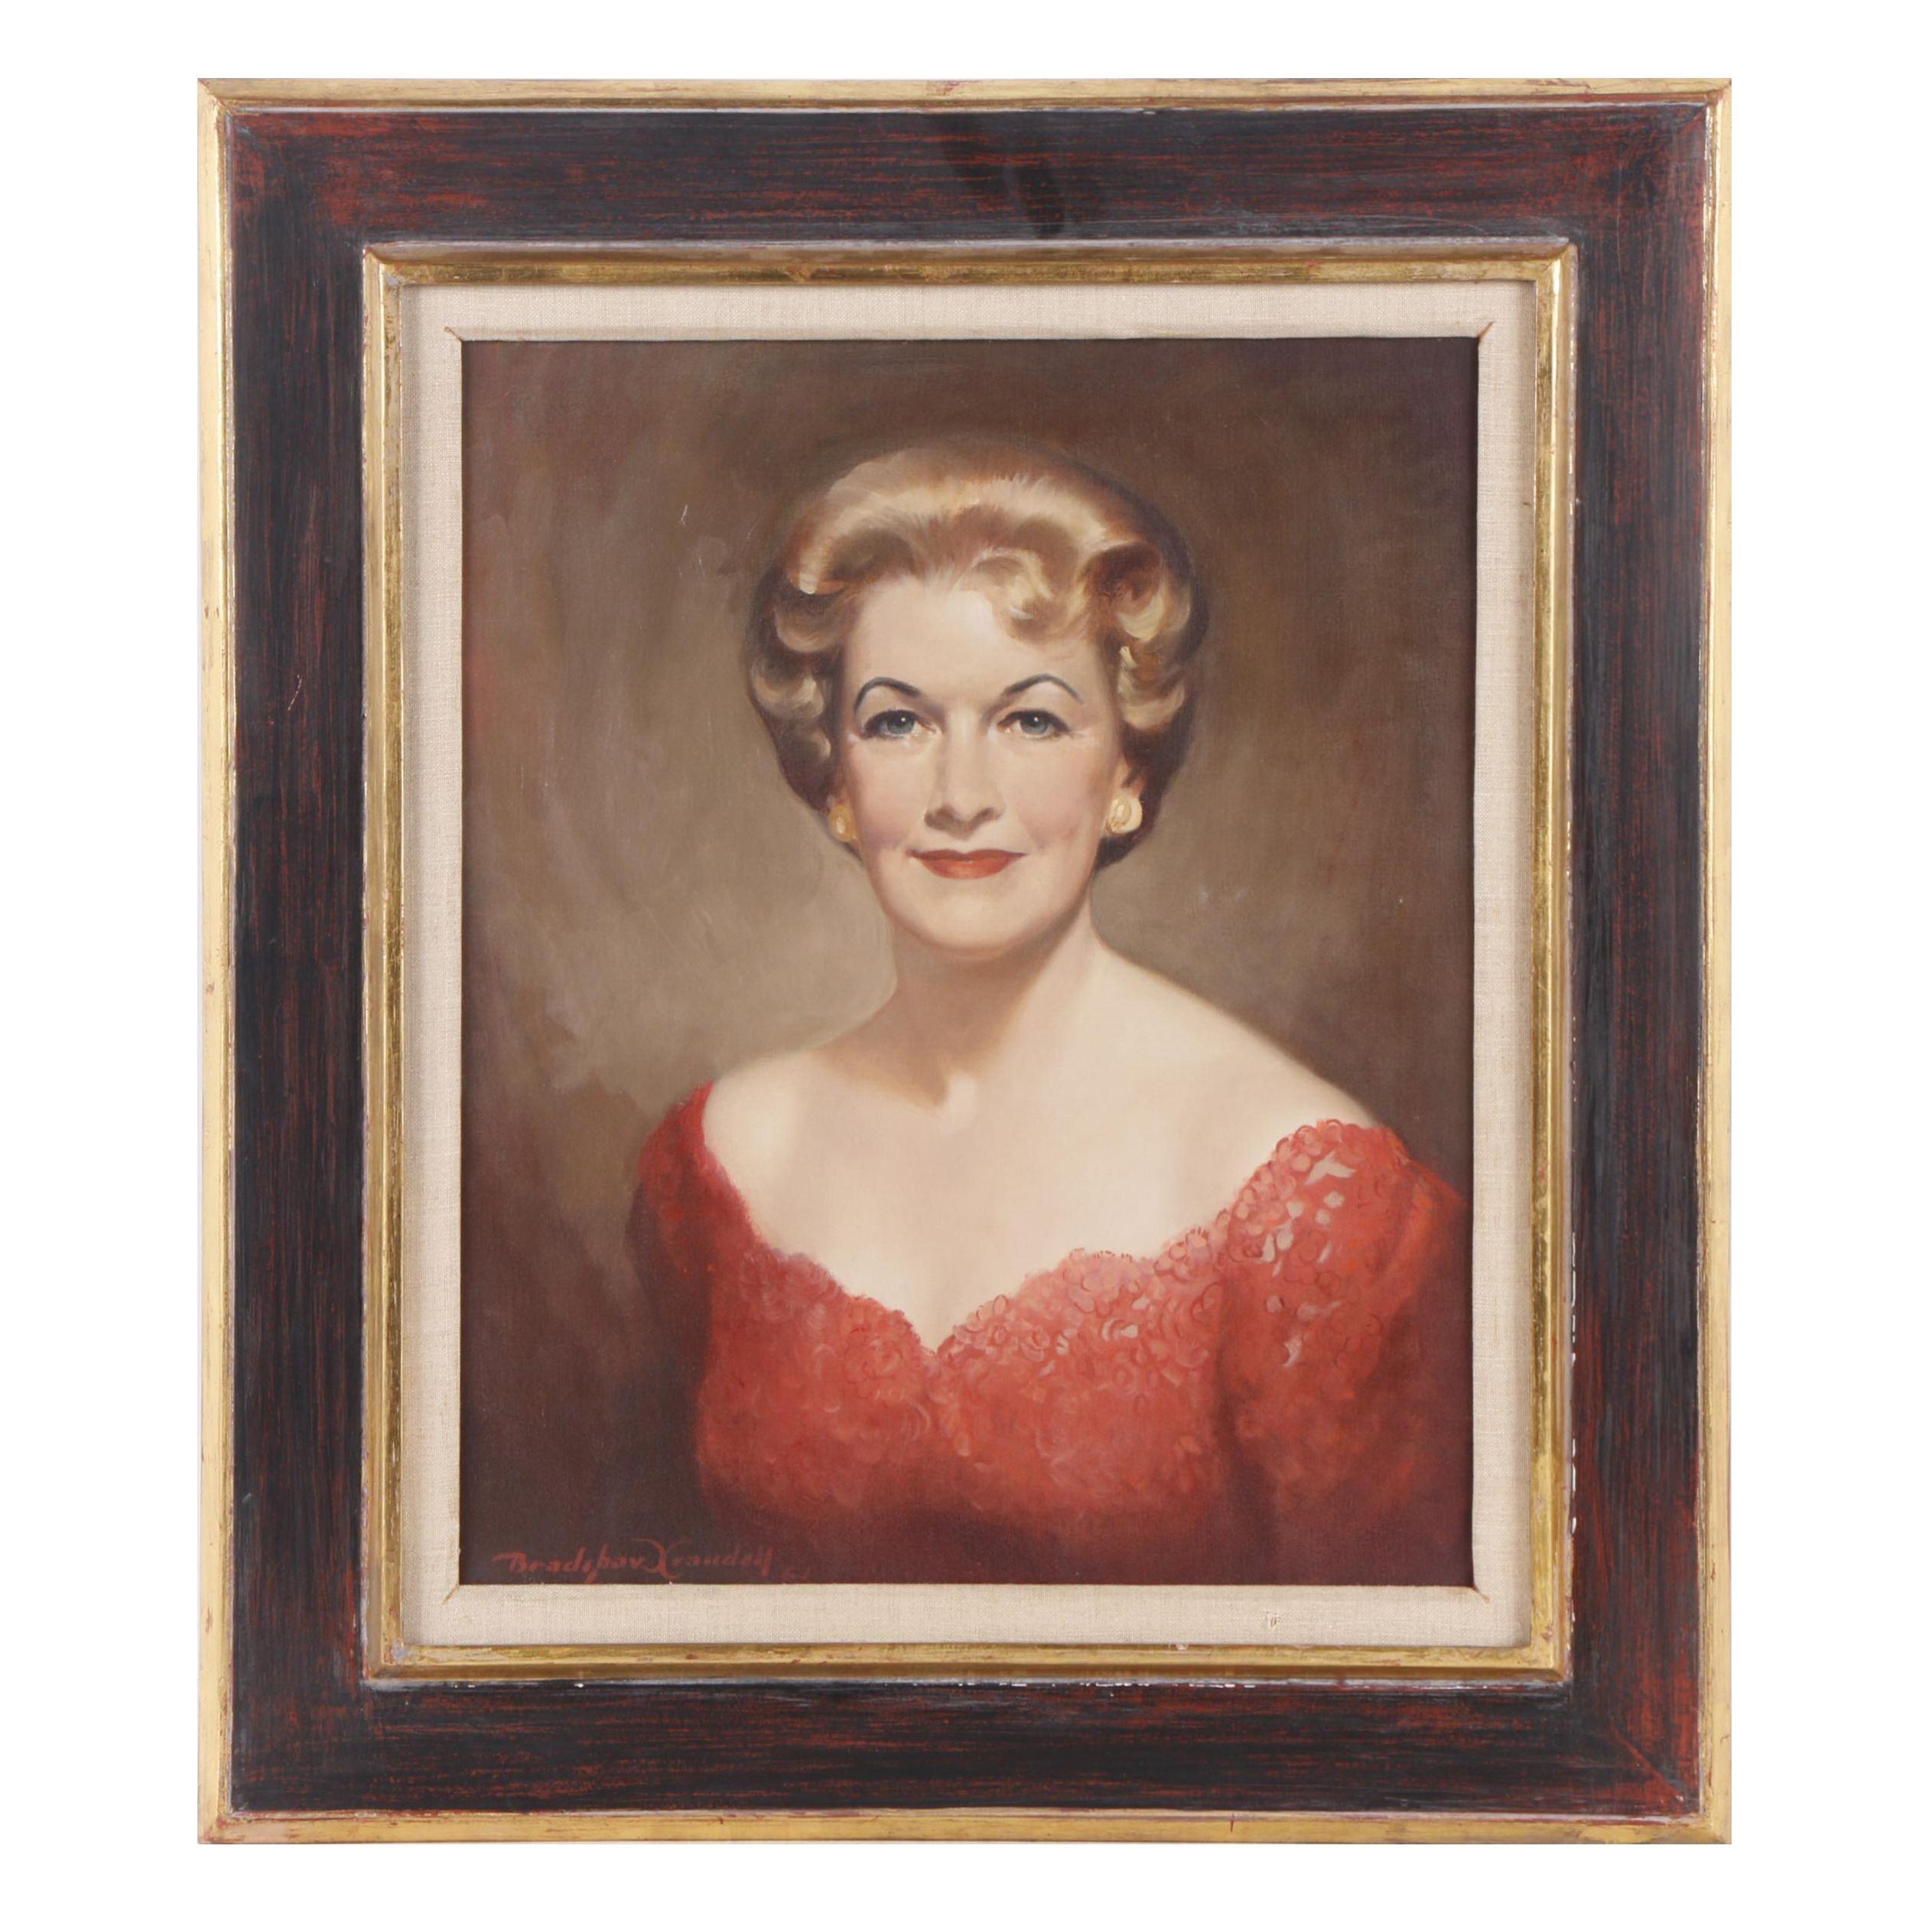 1961 Bradshaw Crandell Oil Painting